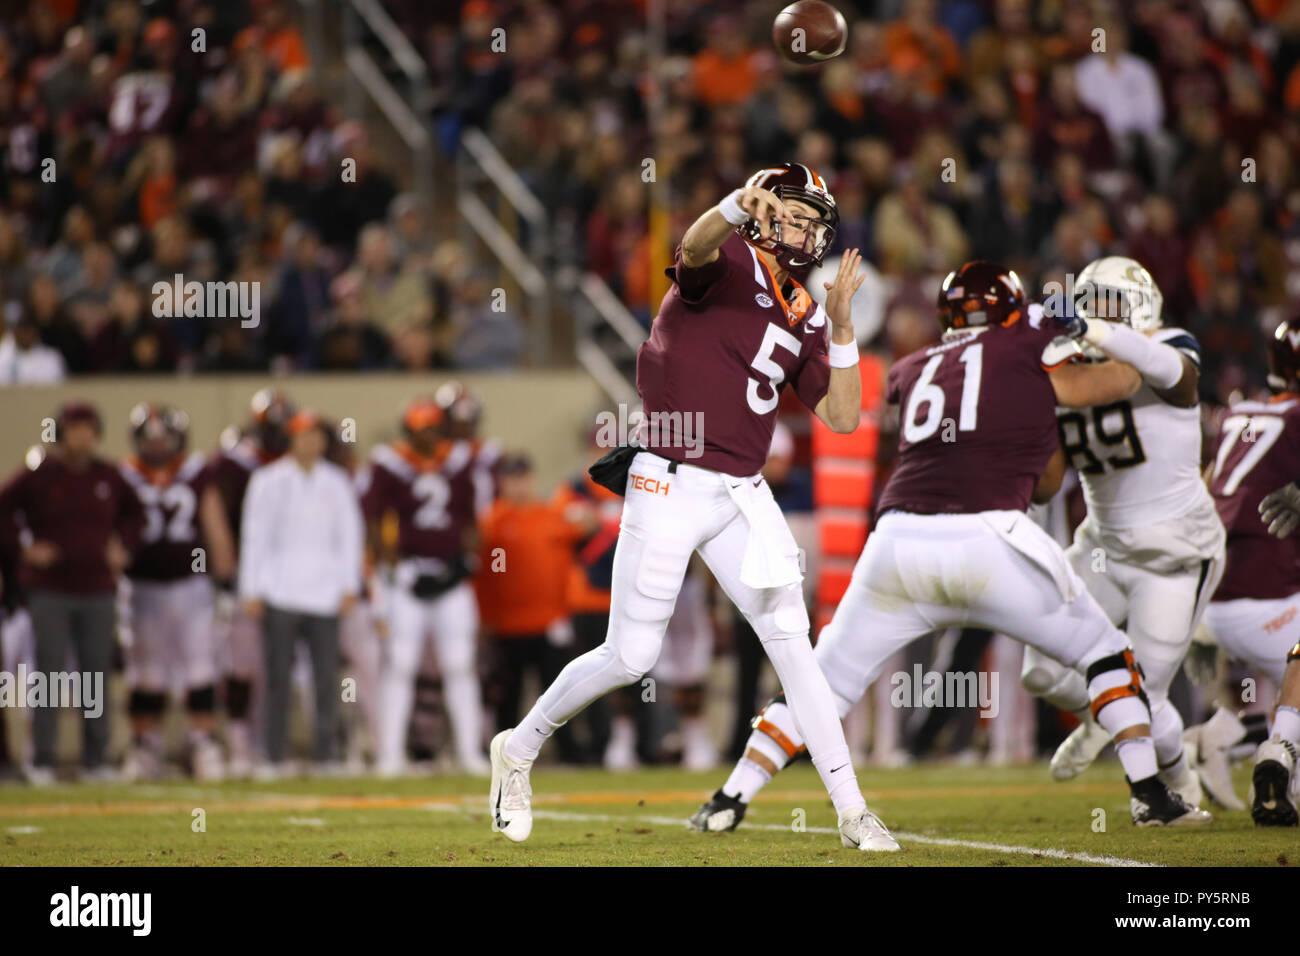 Blacksburg Va Usa 25th Oct 2018 Virginia Tech Hokies Quarterback Ryan Willis 5 Drops Back To